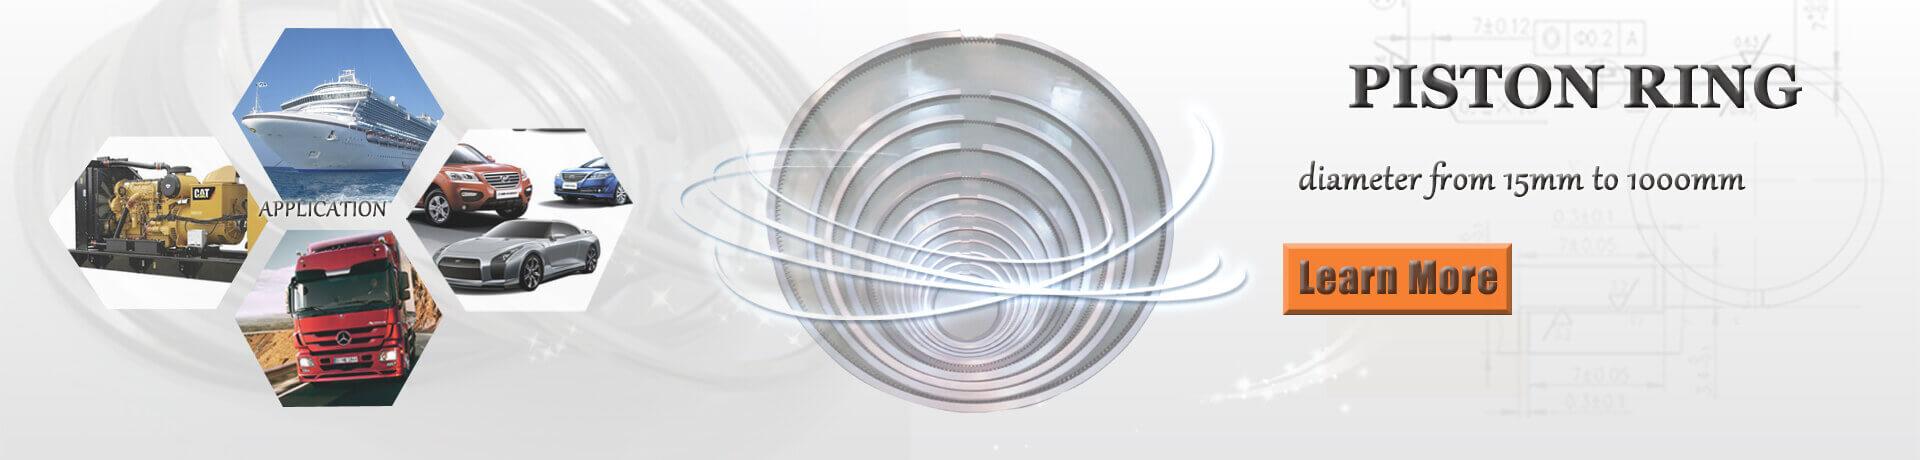 piston ring-YLD PARTS